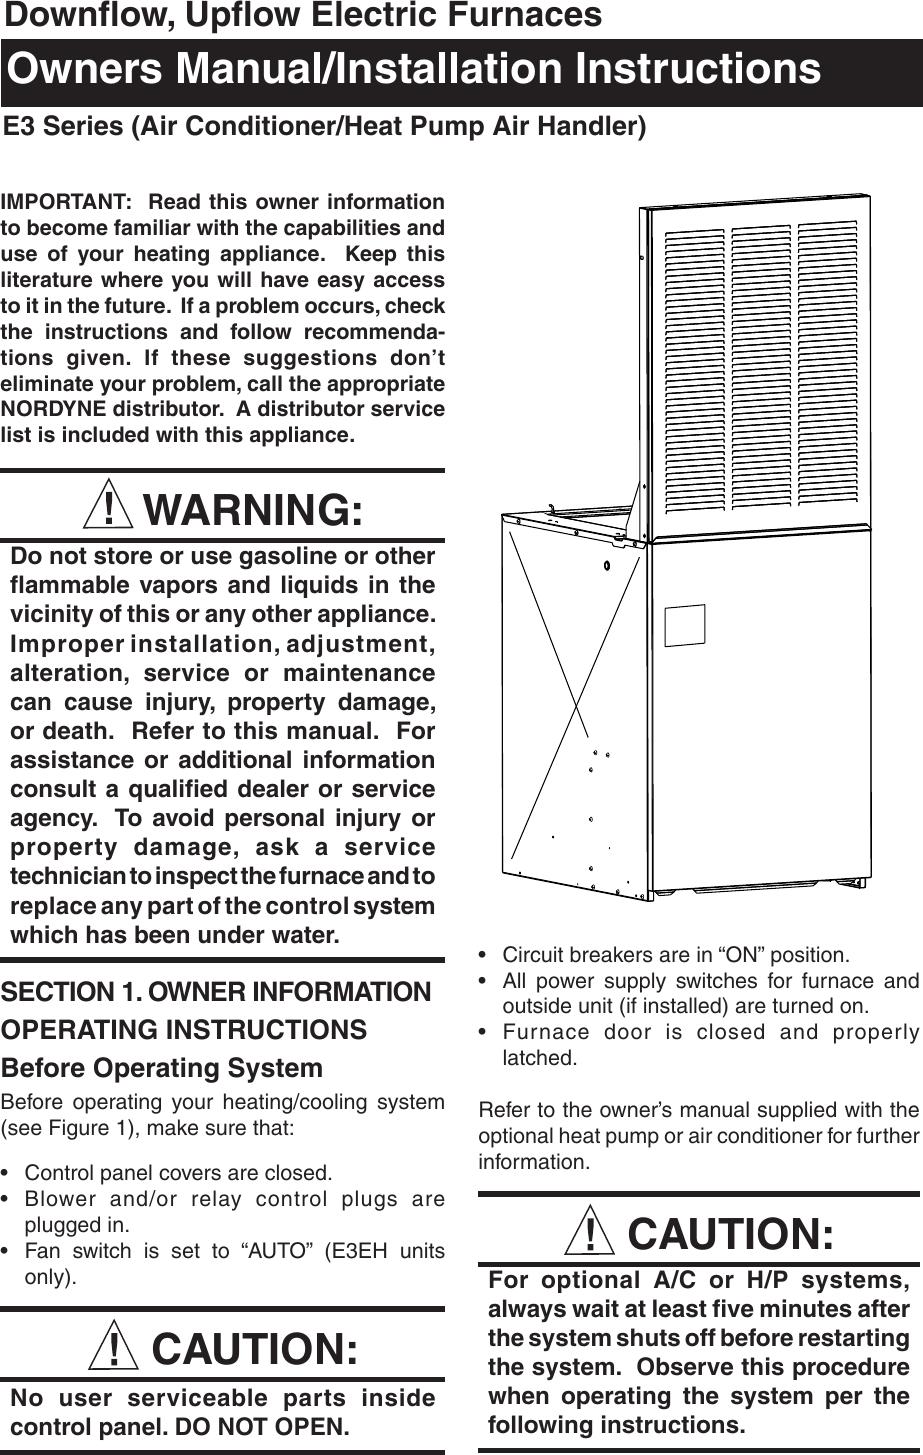 Nordyne E3 Users Manual 708827 0 Series Elec Furn on